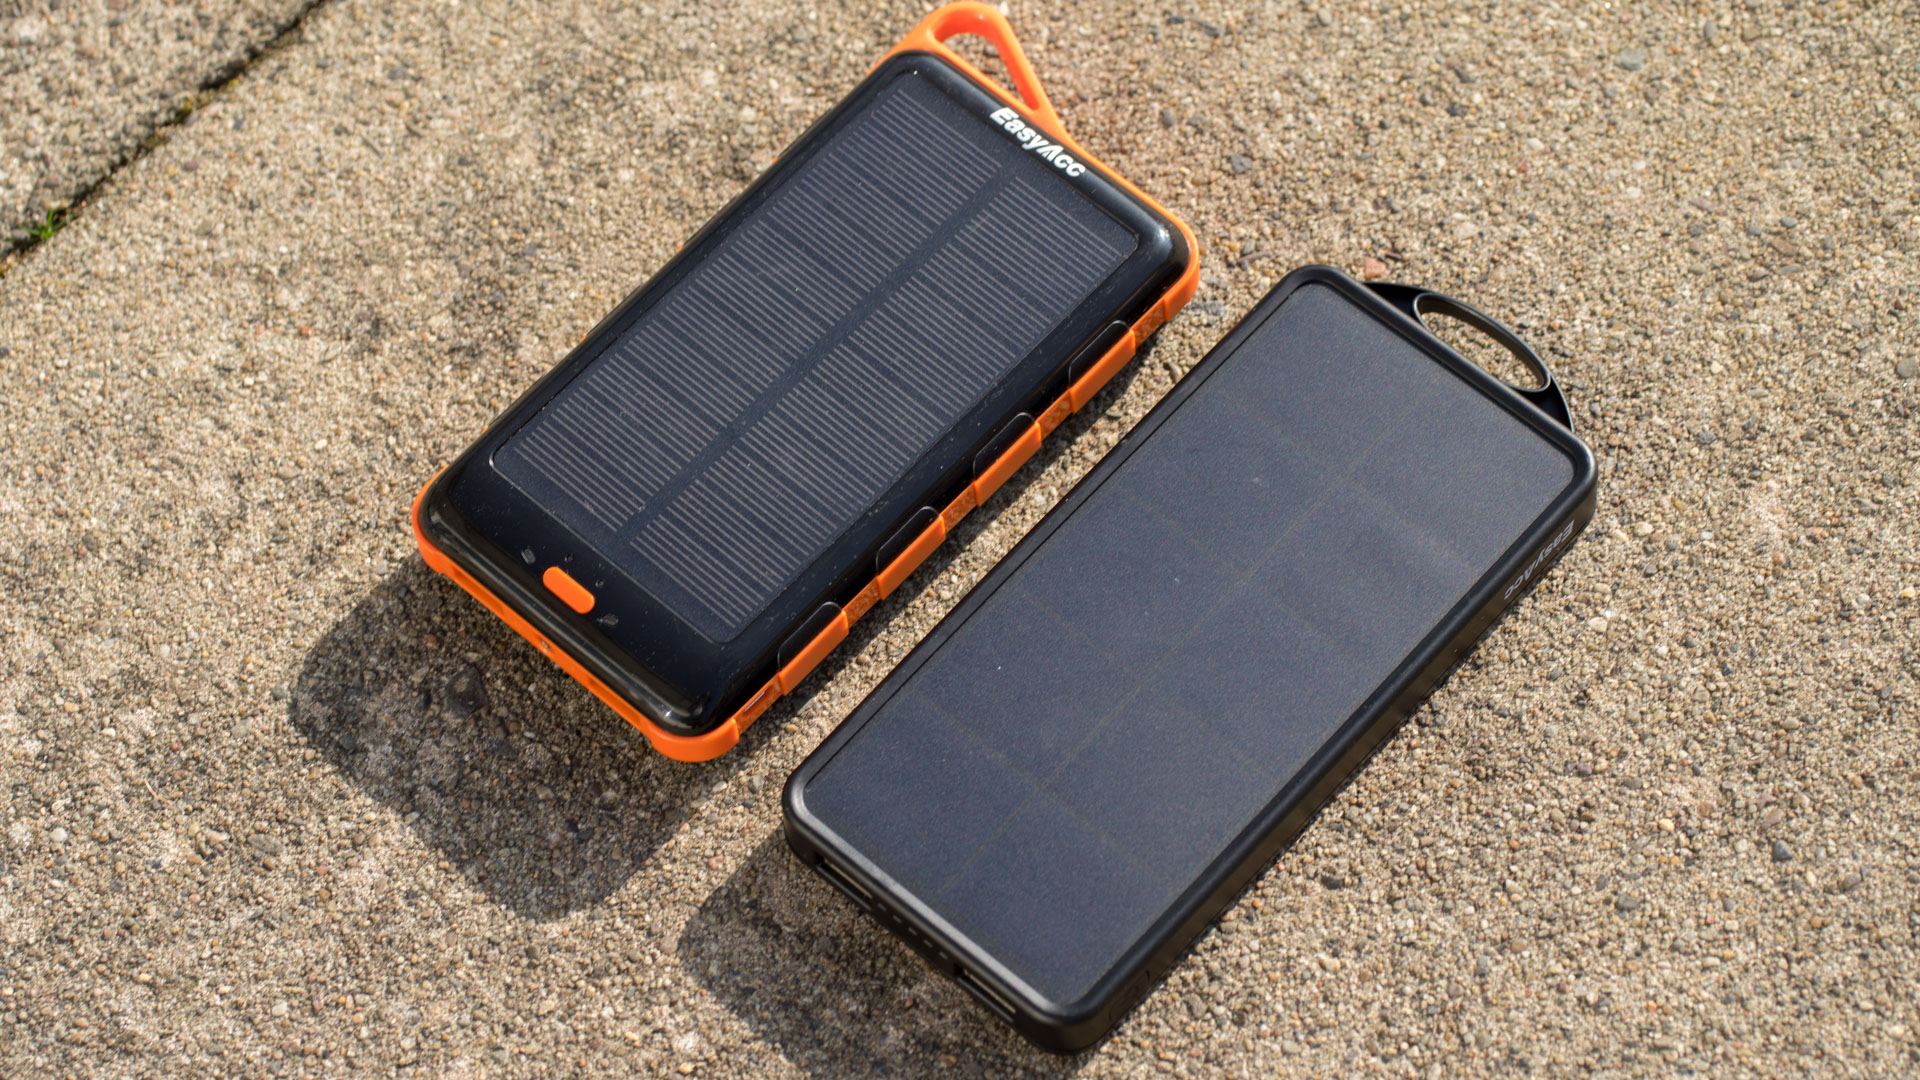 Gute Solar Powerbank Von Easyacc Im Test Die Easyacc